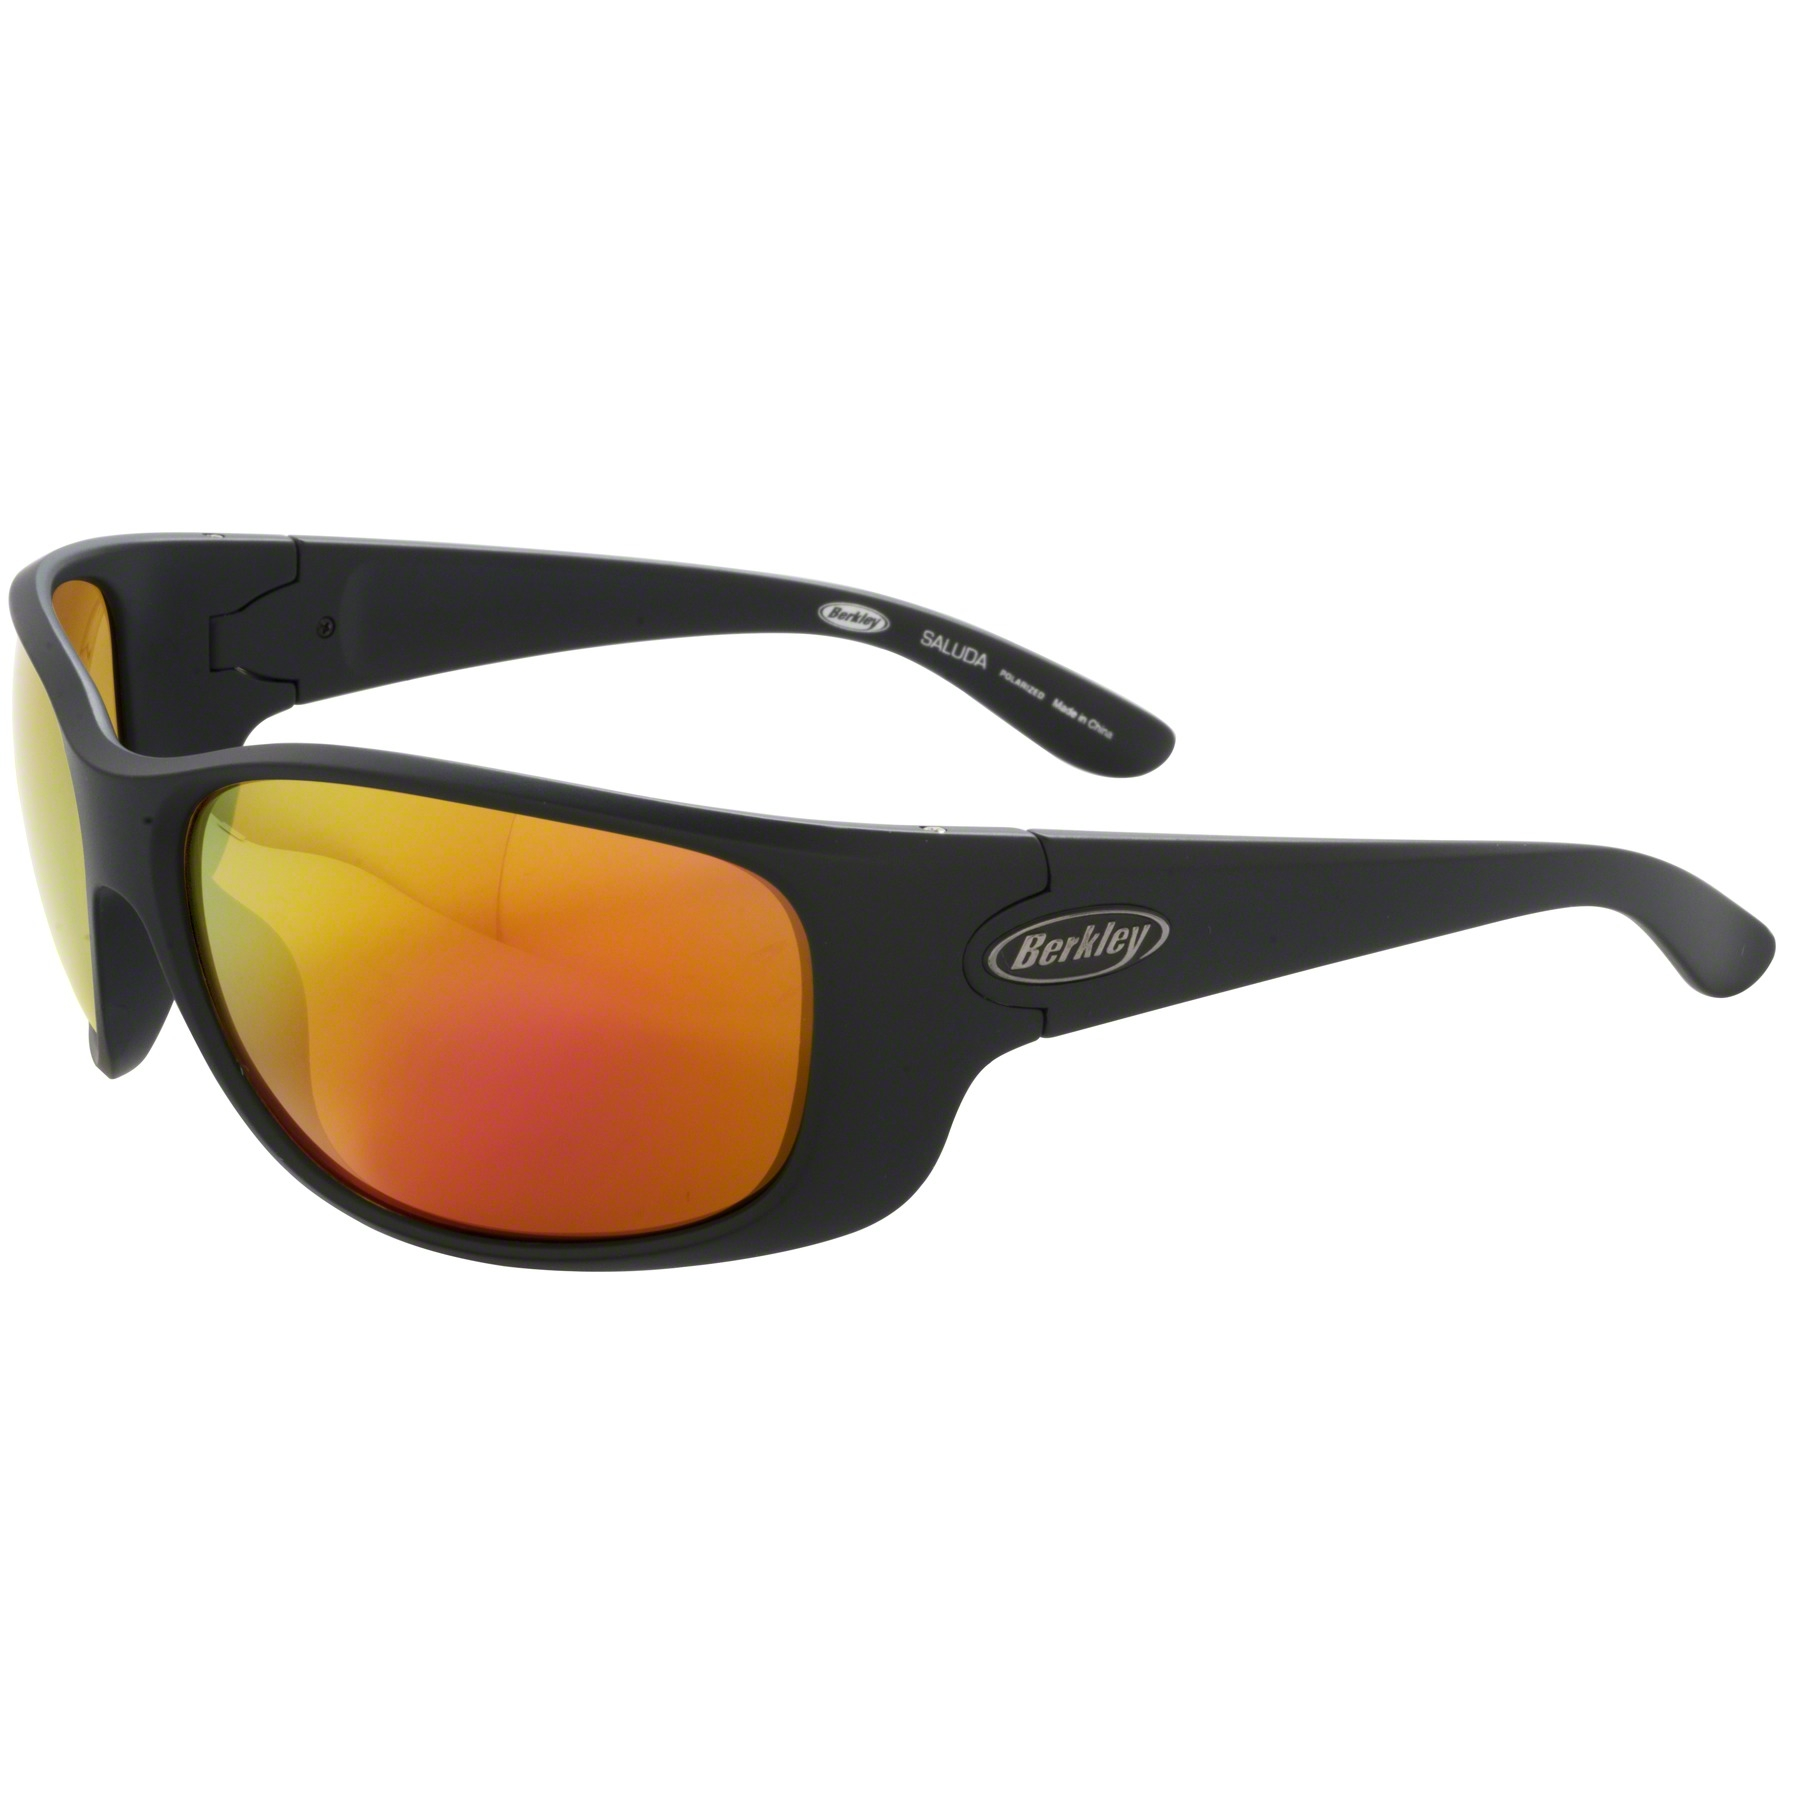 8ccd13229a7 Berkley BSSALUMBCRM-H Saluda Sunglasses